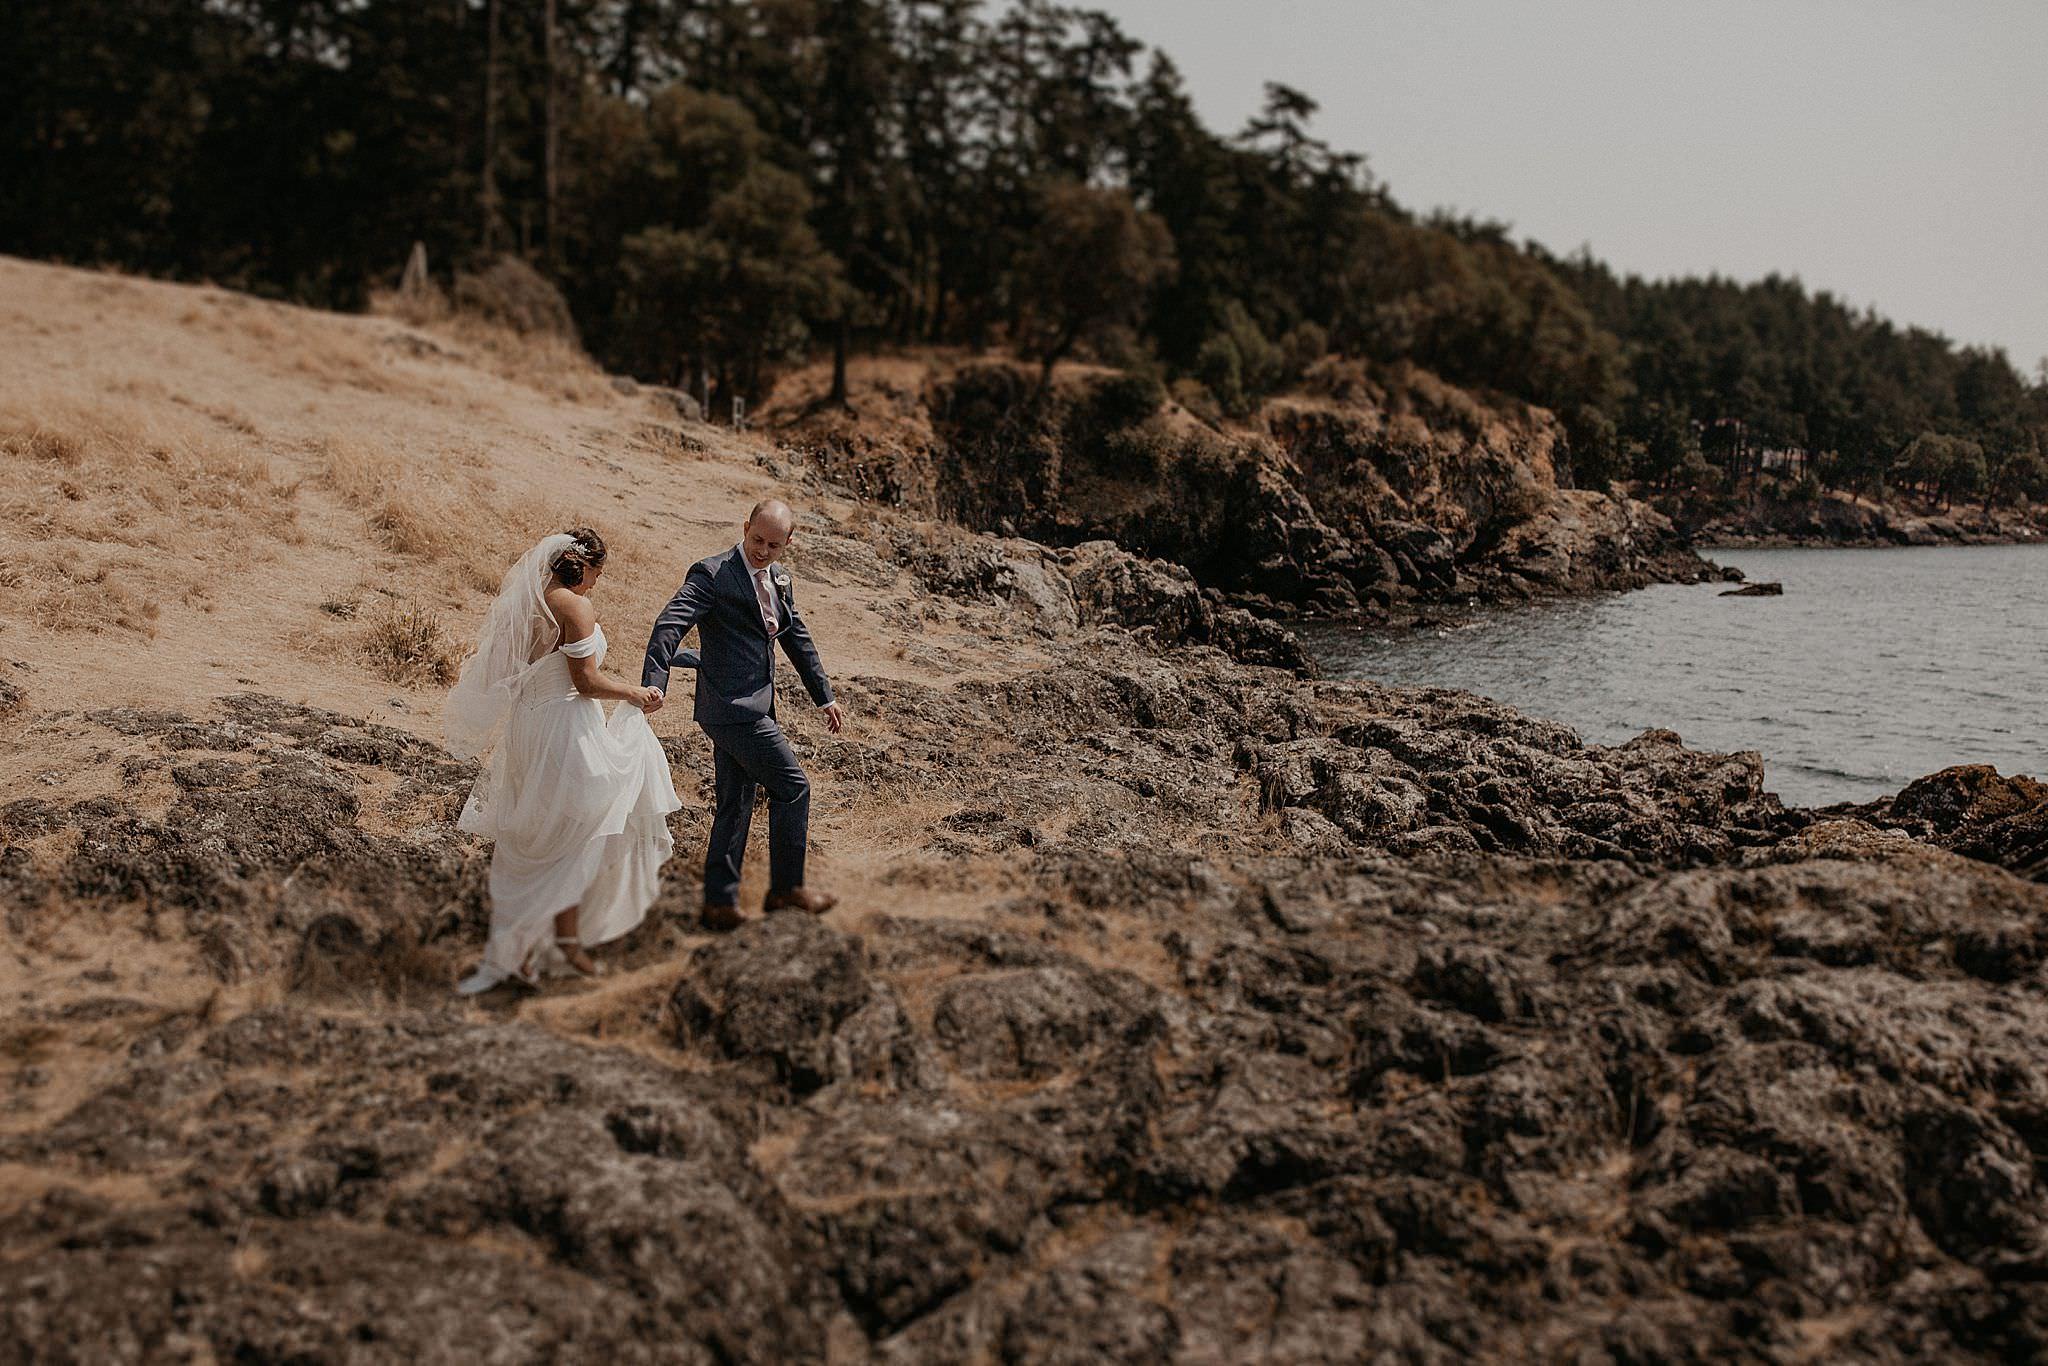 roche-harbor-wedding-san-juans-island-washington_0035.jpg